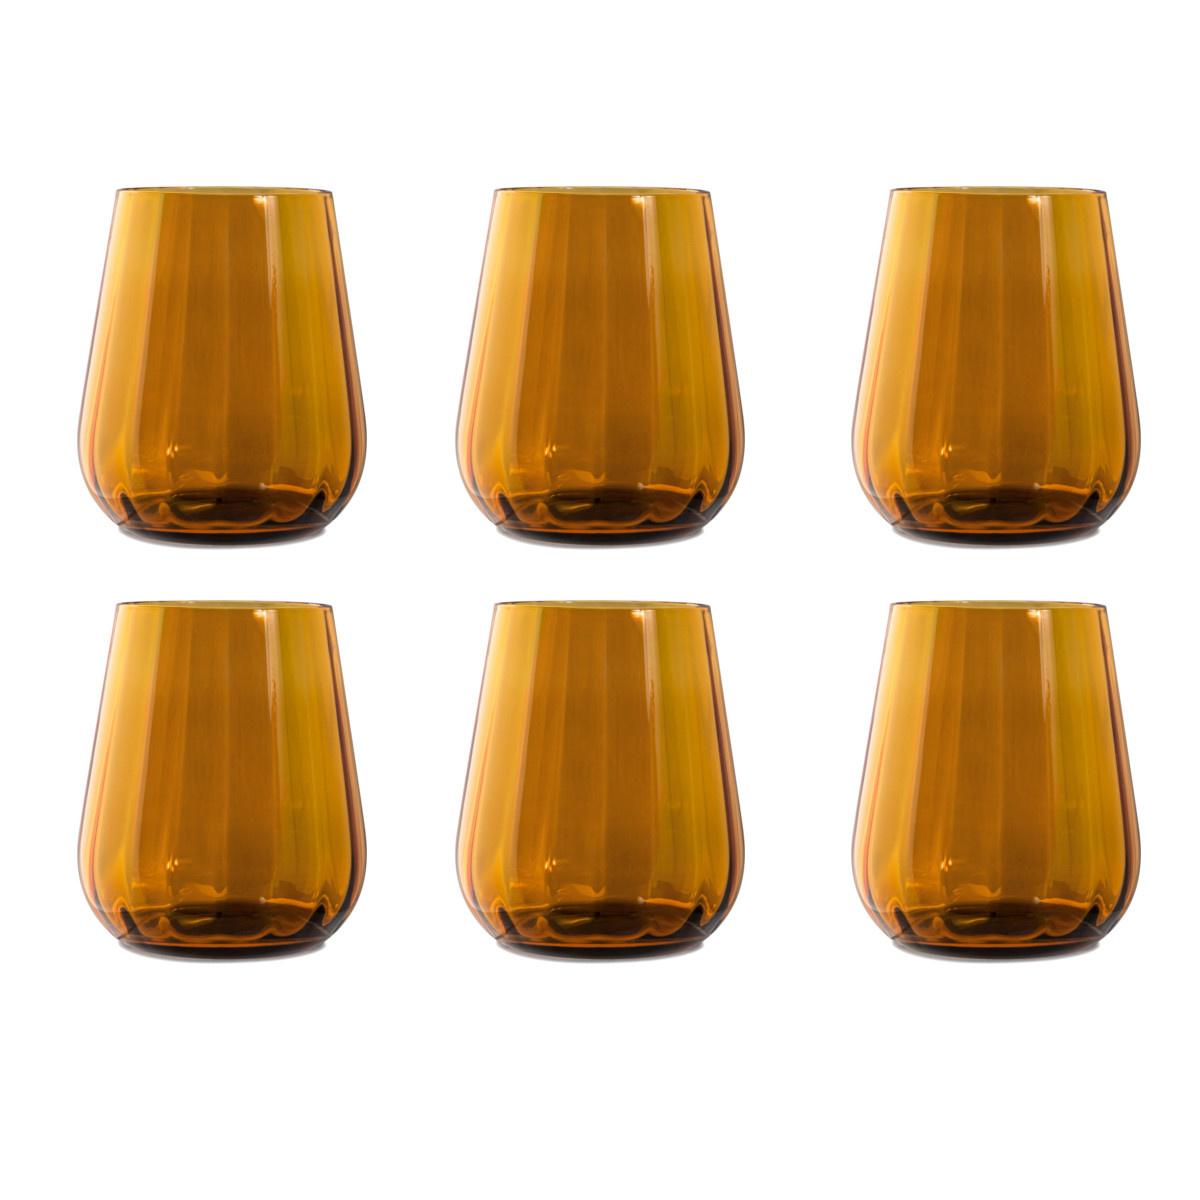 Livellara Livellara RINASCIMENTO  Tumbler 400 ml – Set of 6 – Amber